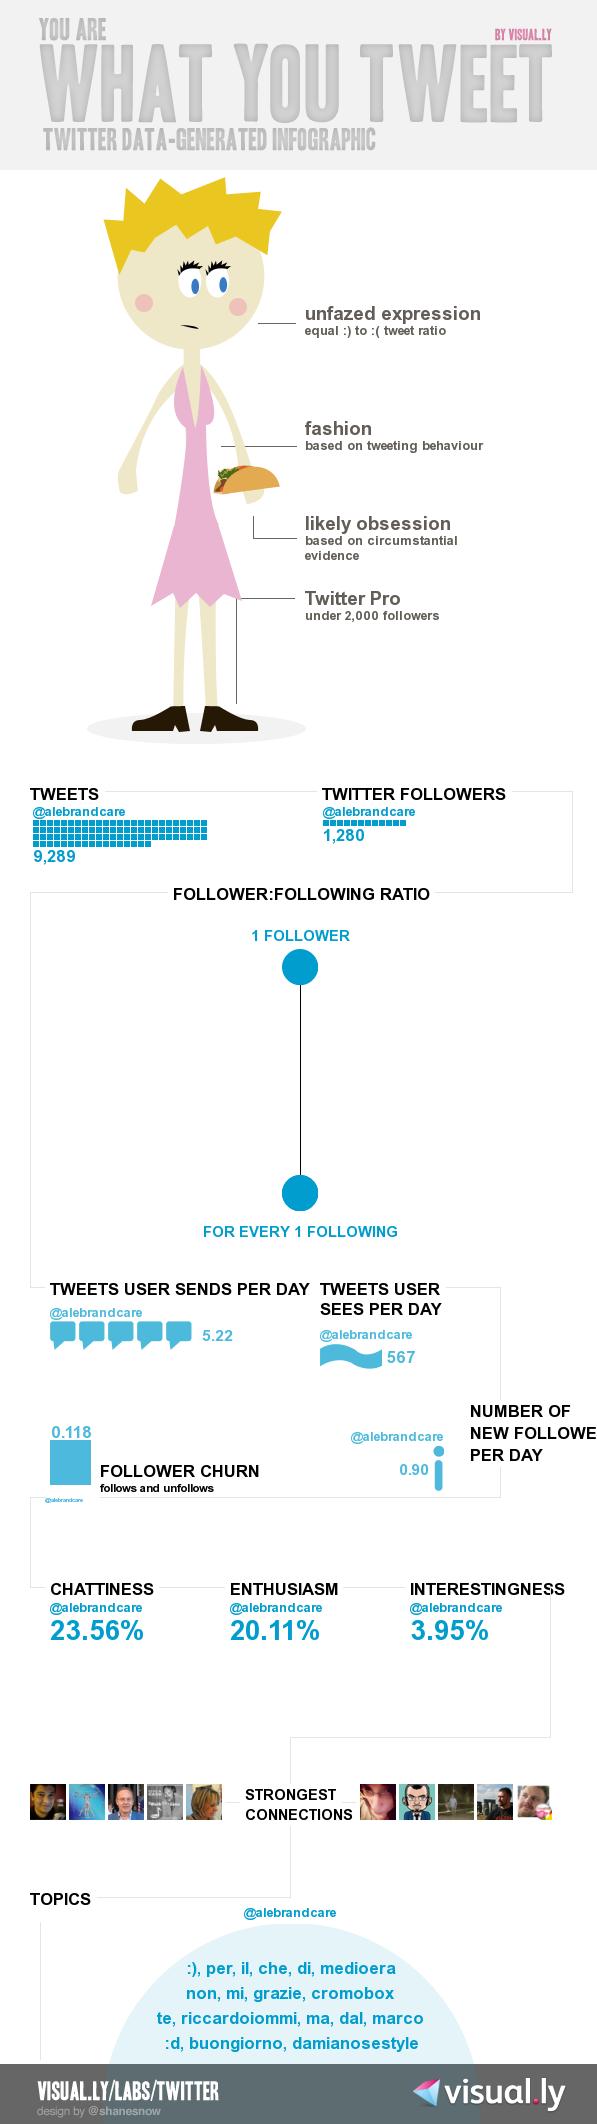 @alebrandcare su Twitter - infographic